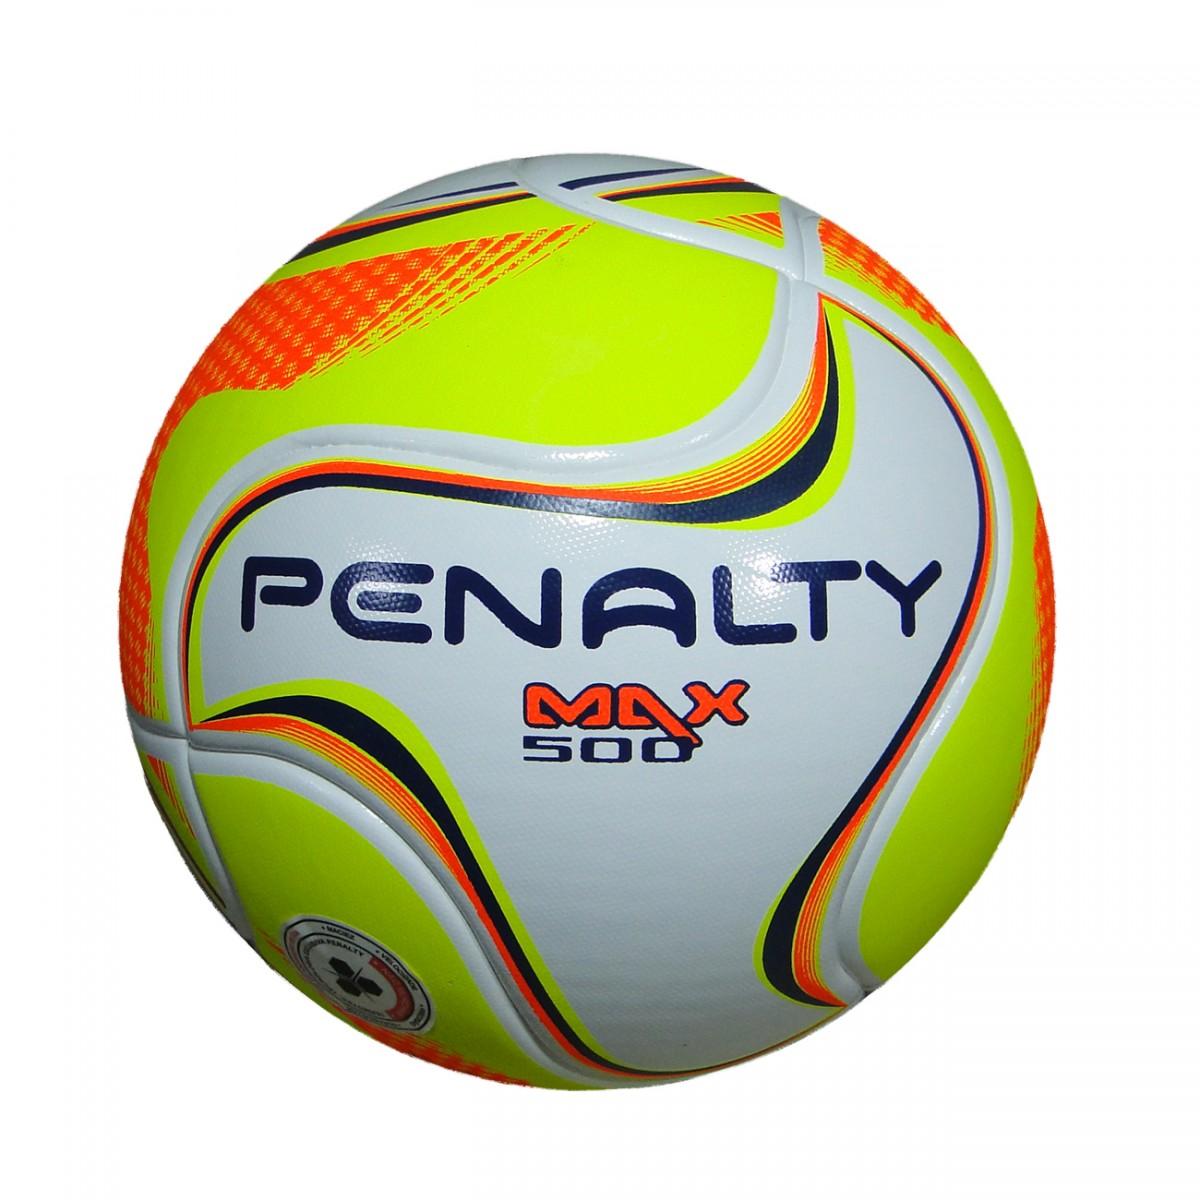 a585efac8a6eb Bola Penalty Max 500 VI Futsal 5413941830 - Branco Amarelo Laranja -  Chuteira Nike